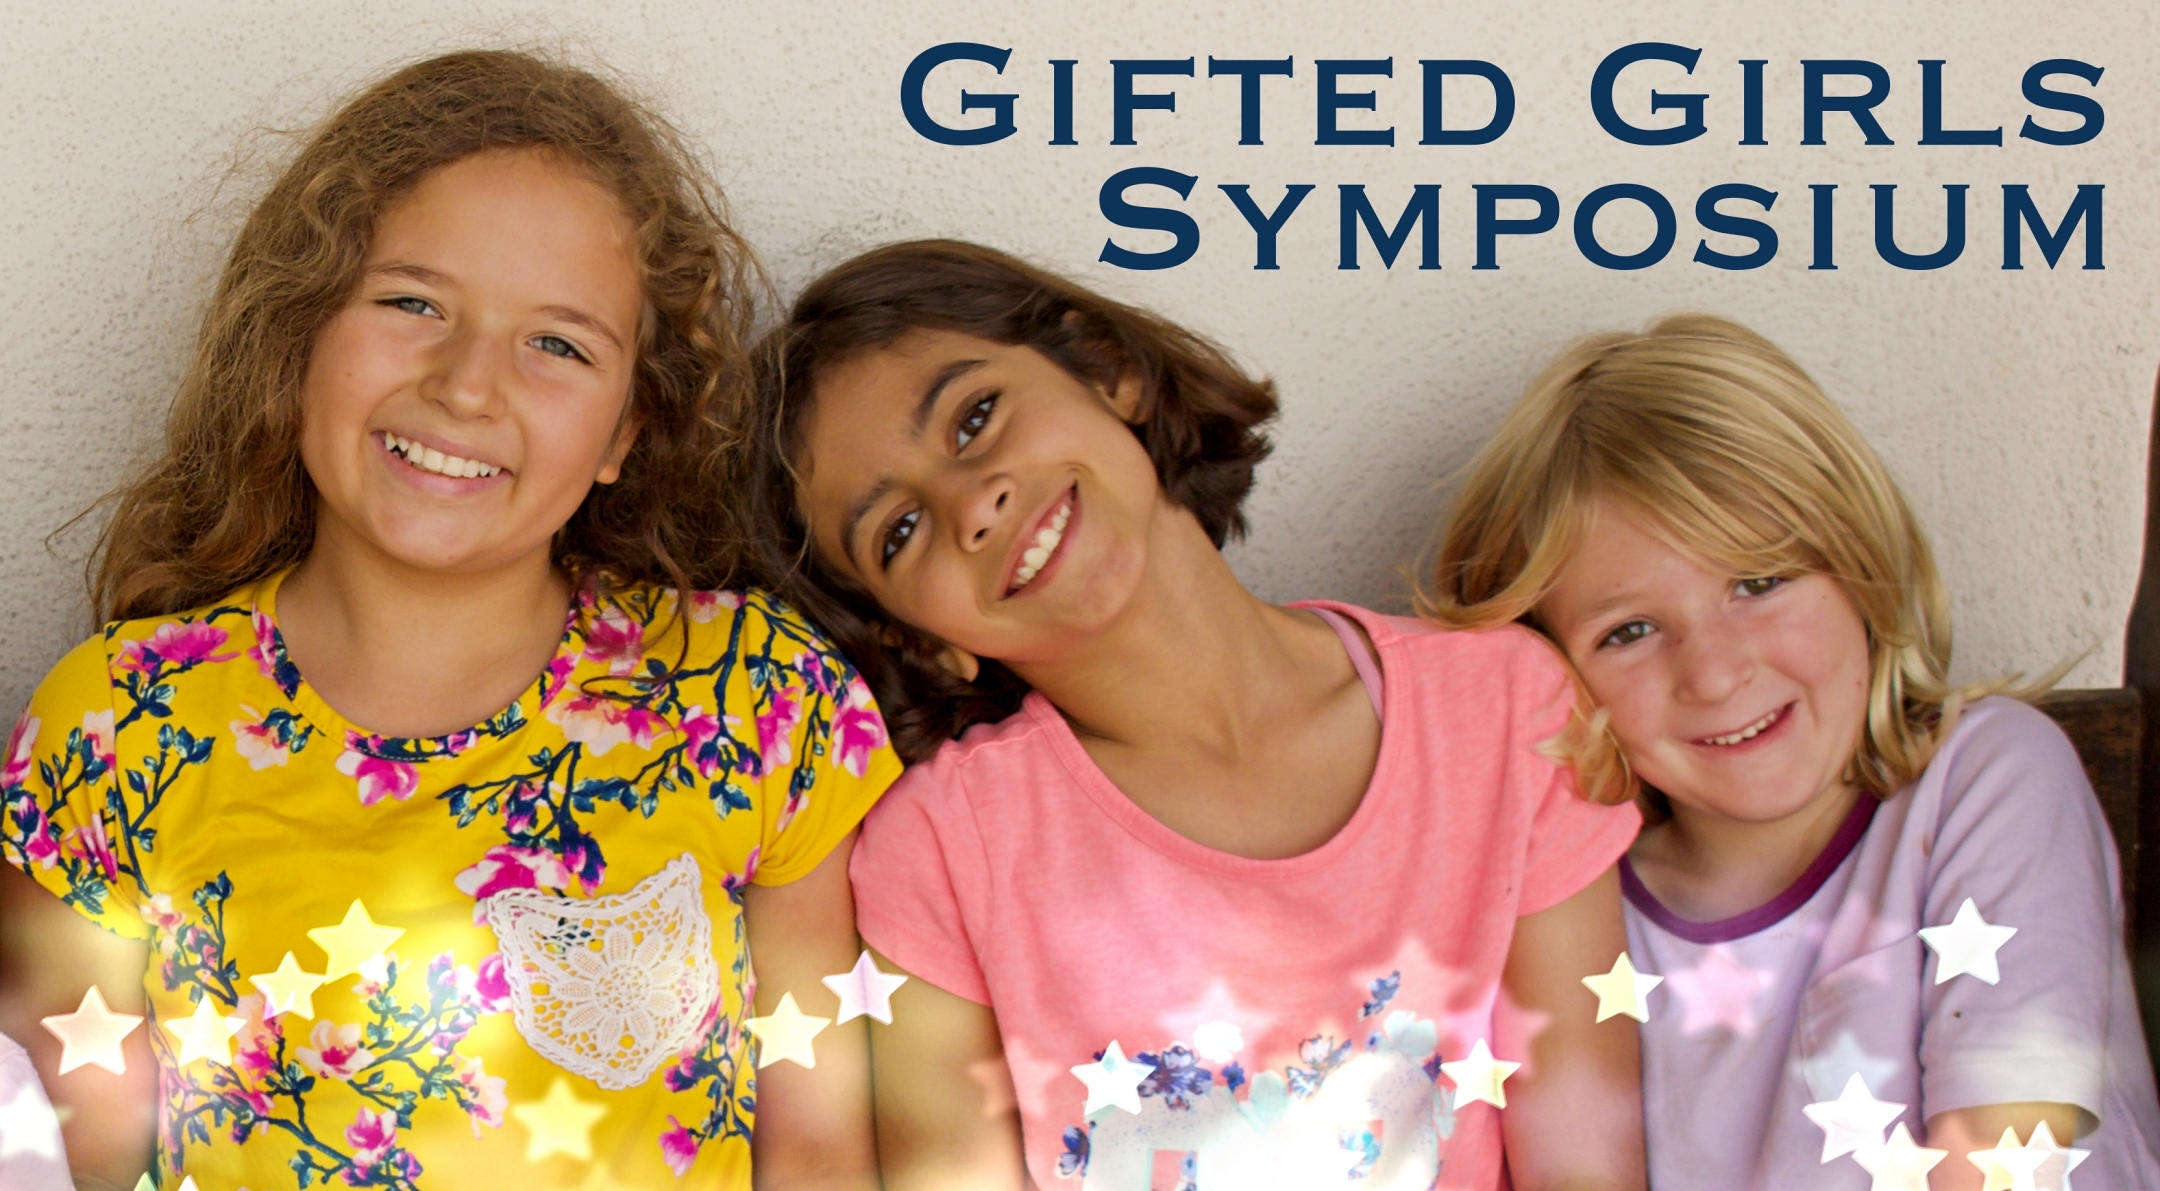 Gifted Girls Symposium